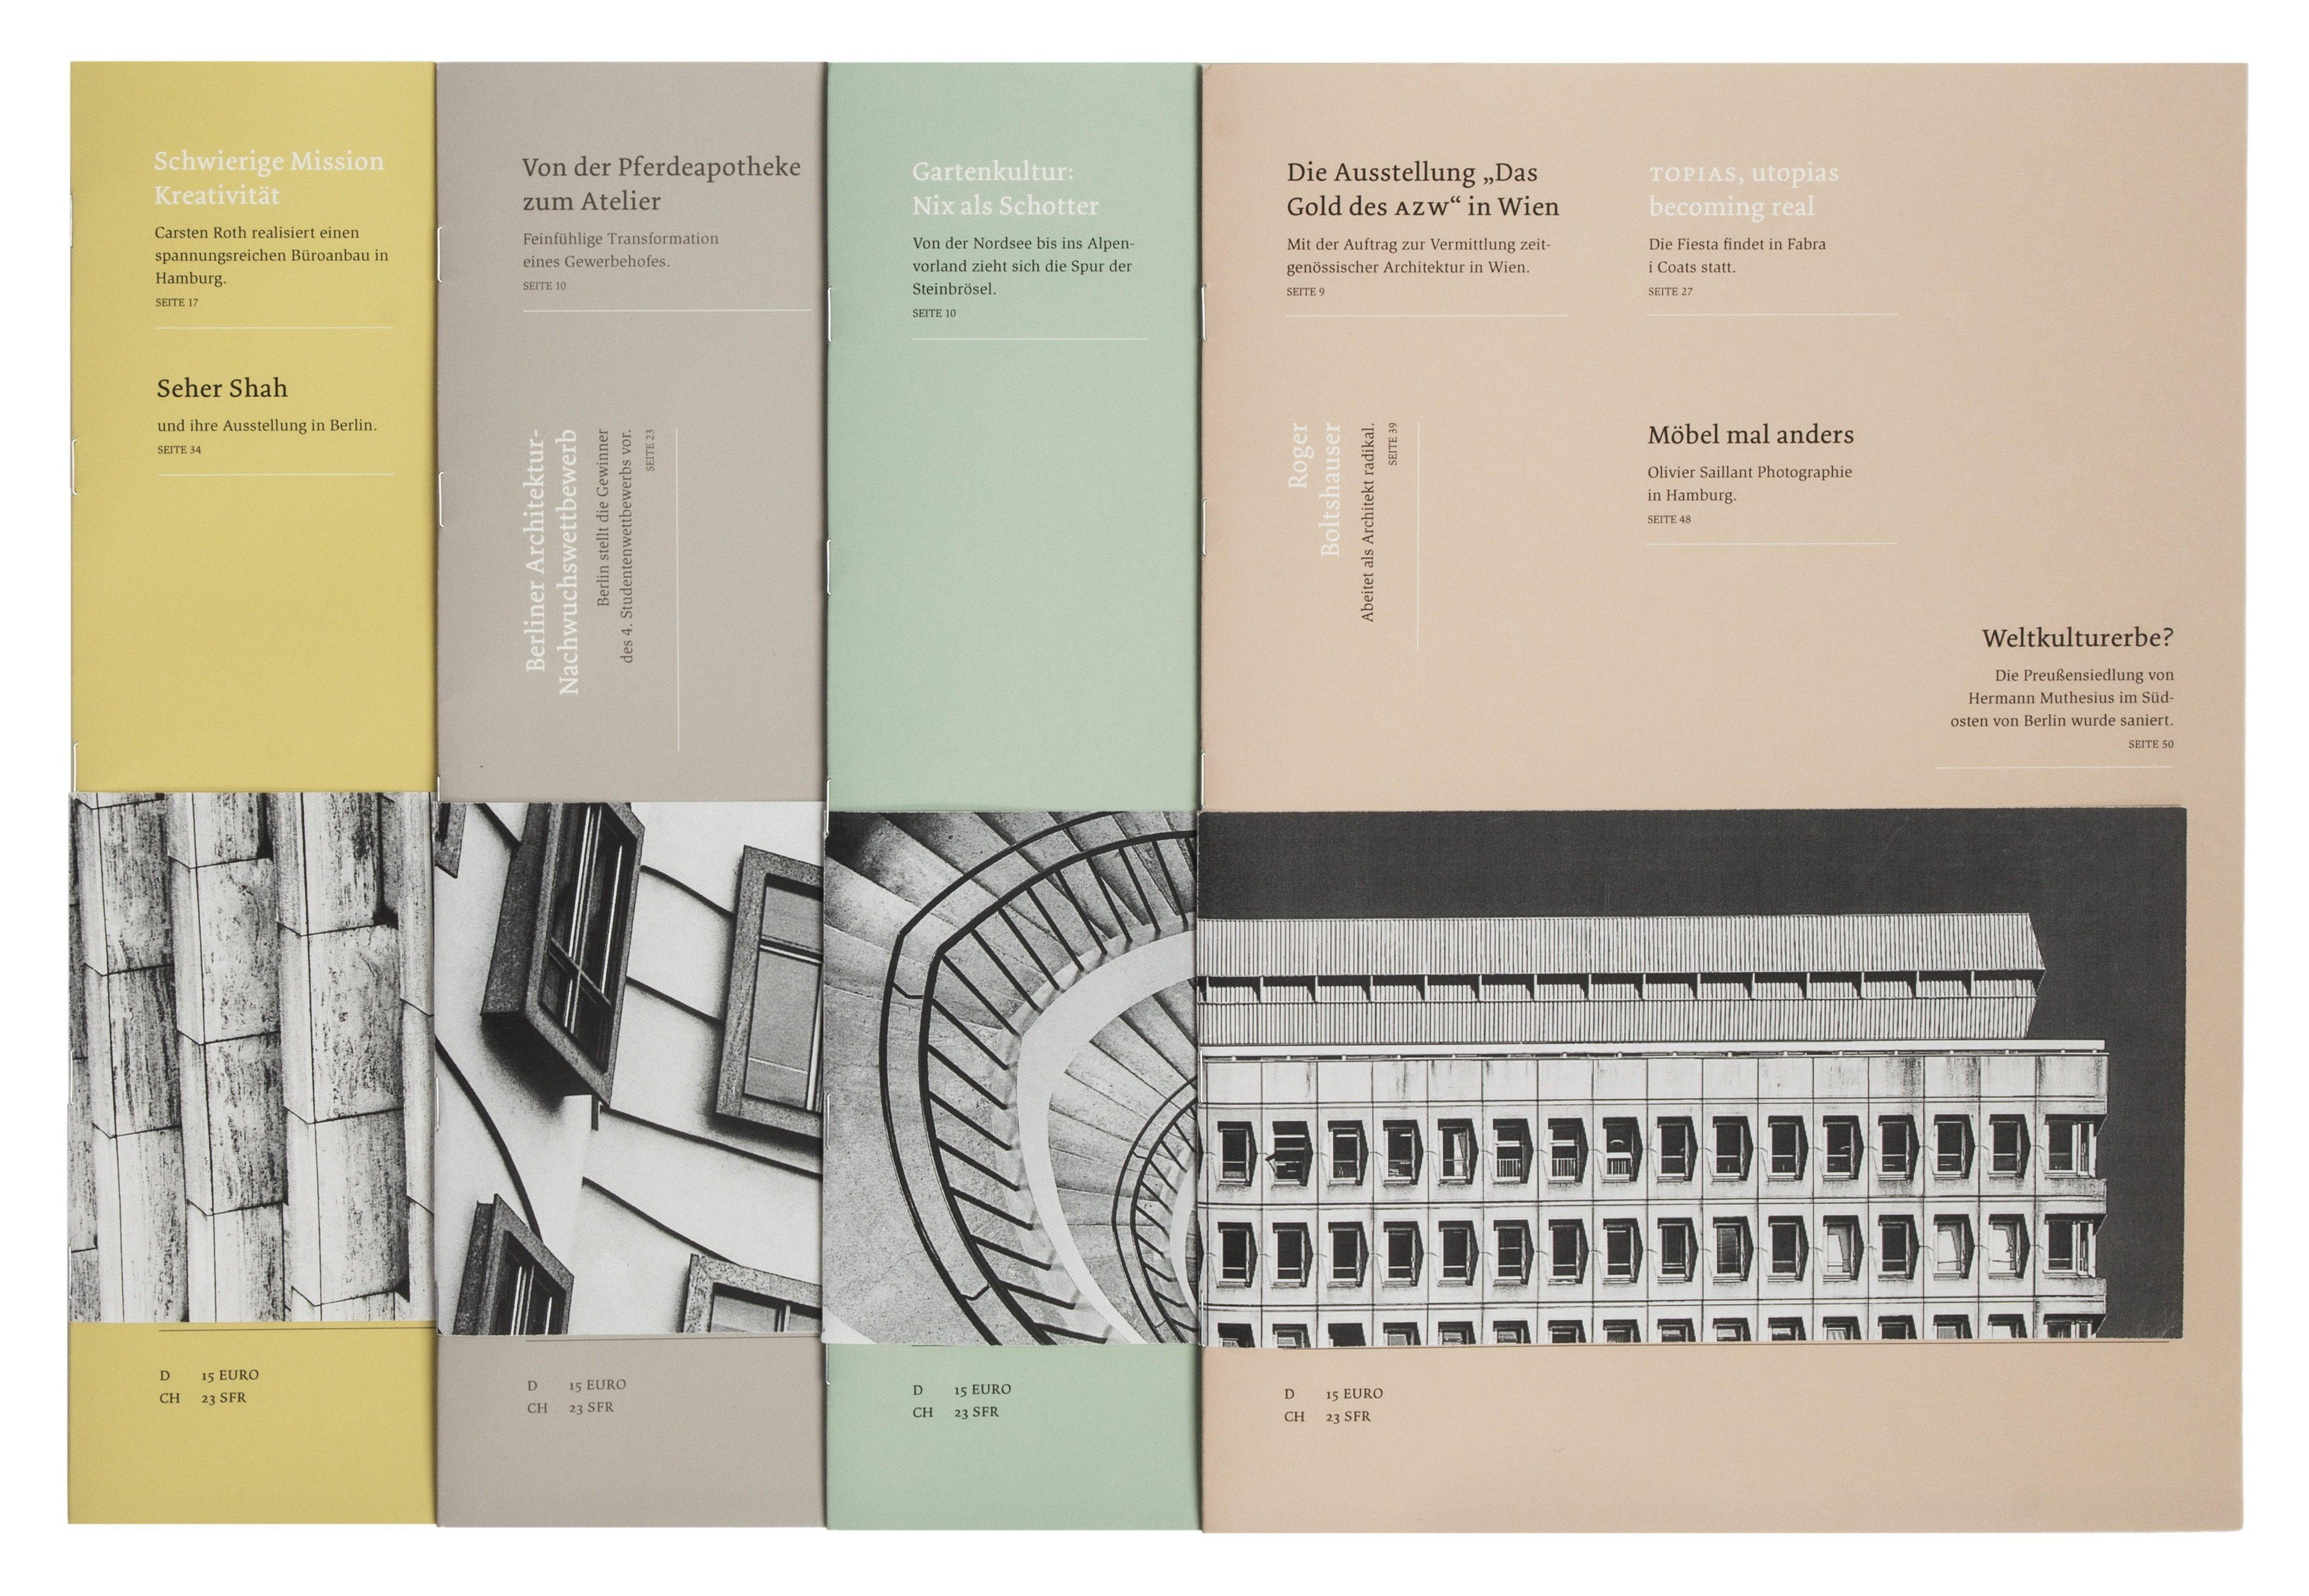 Xtent – Ein Architekturmagazin - Studio tūt